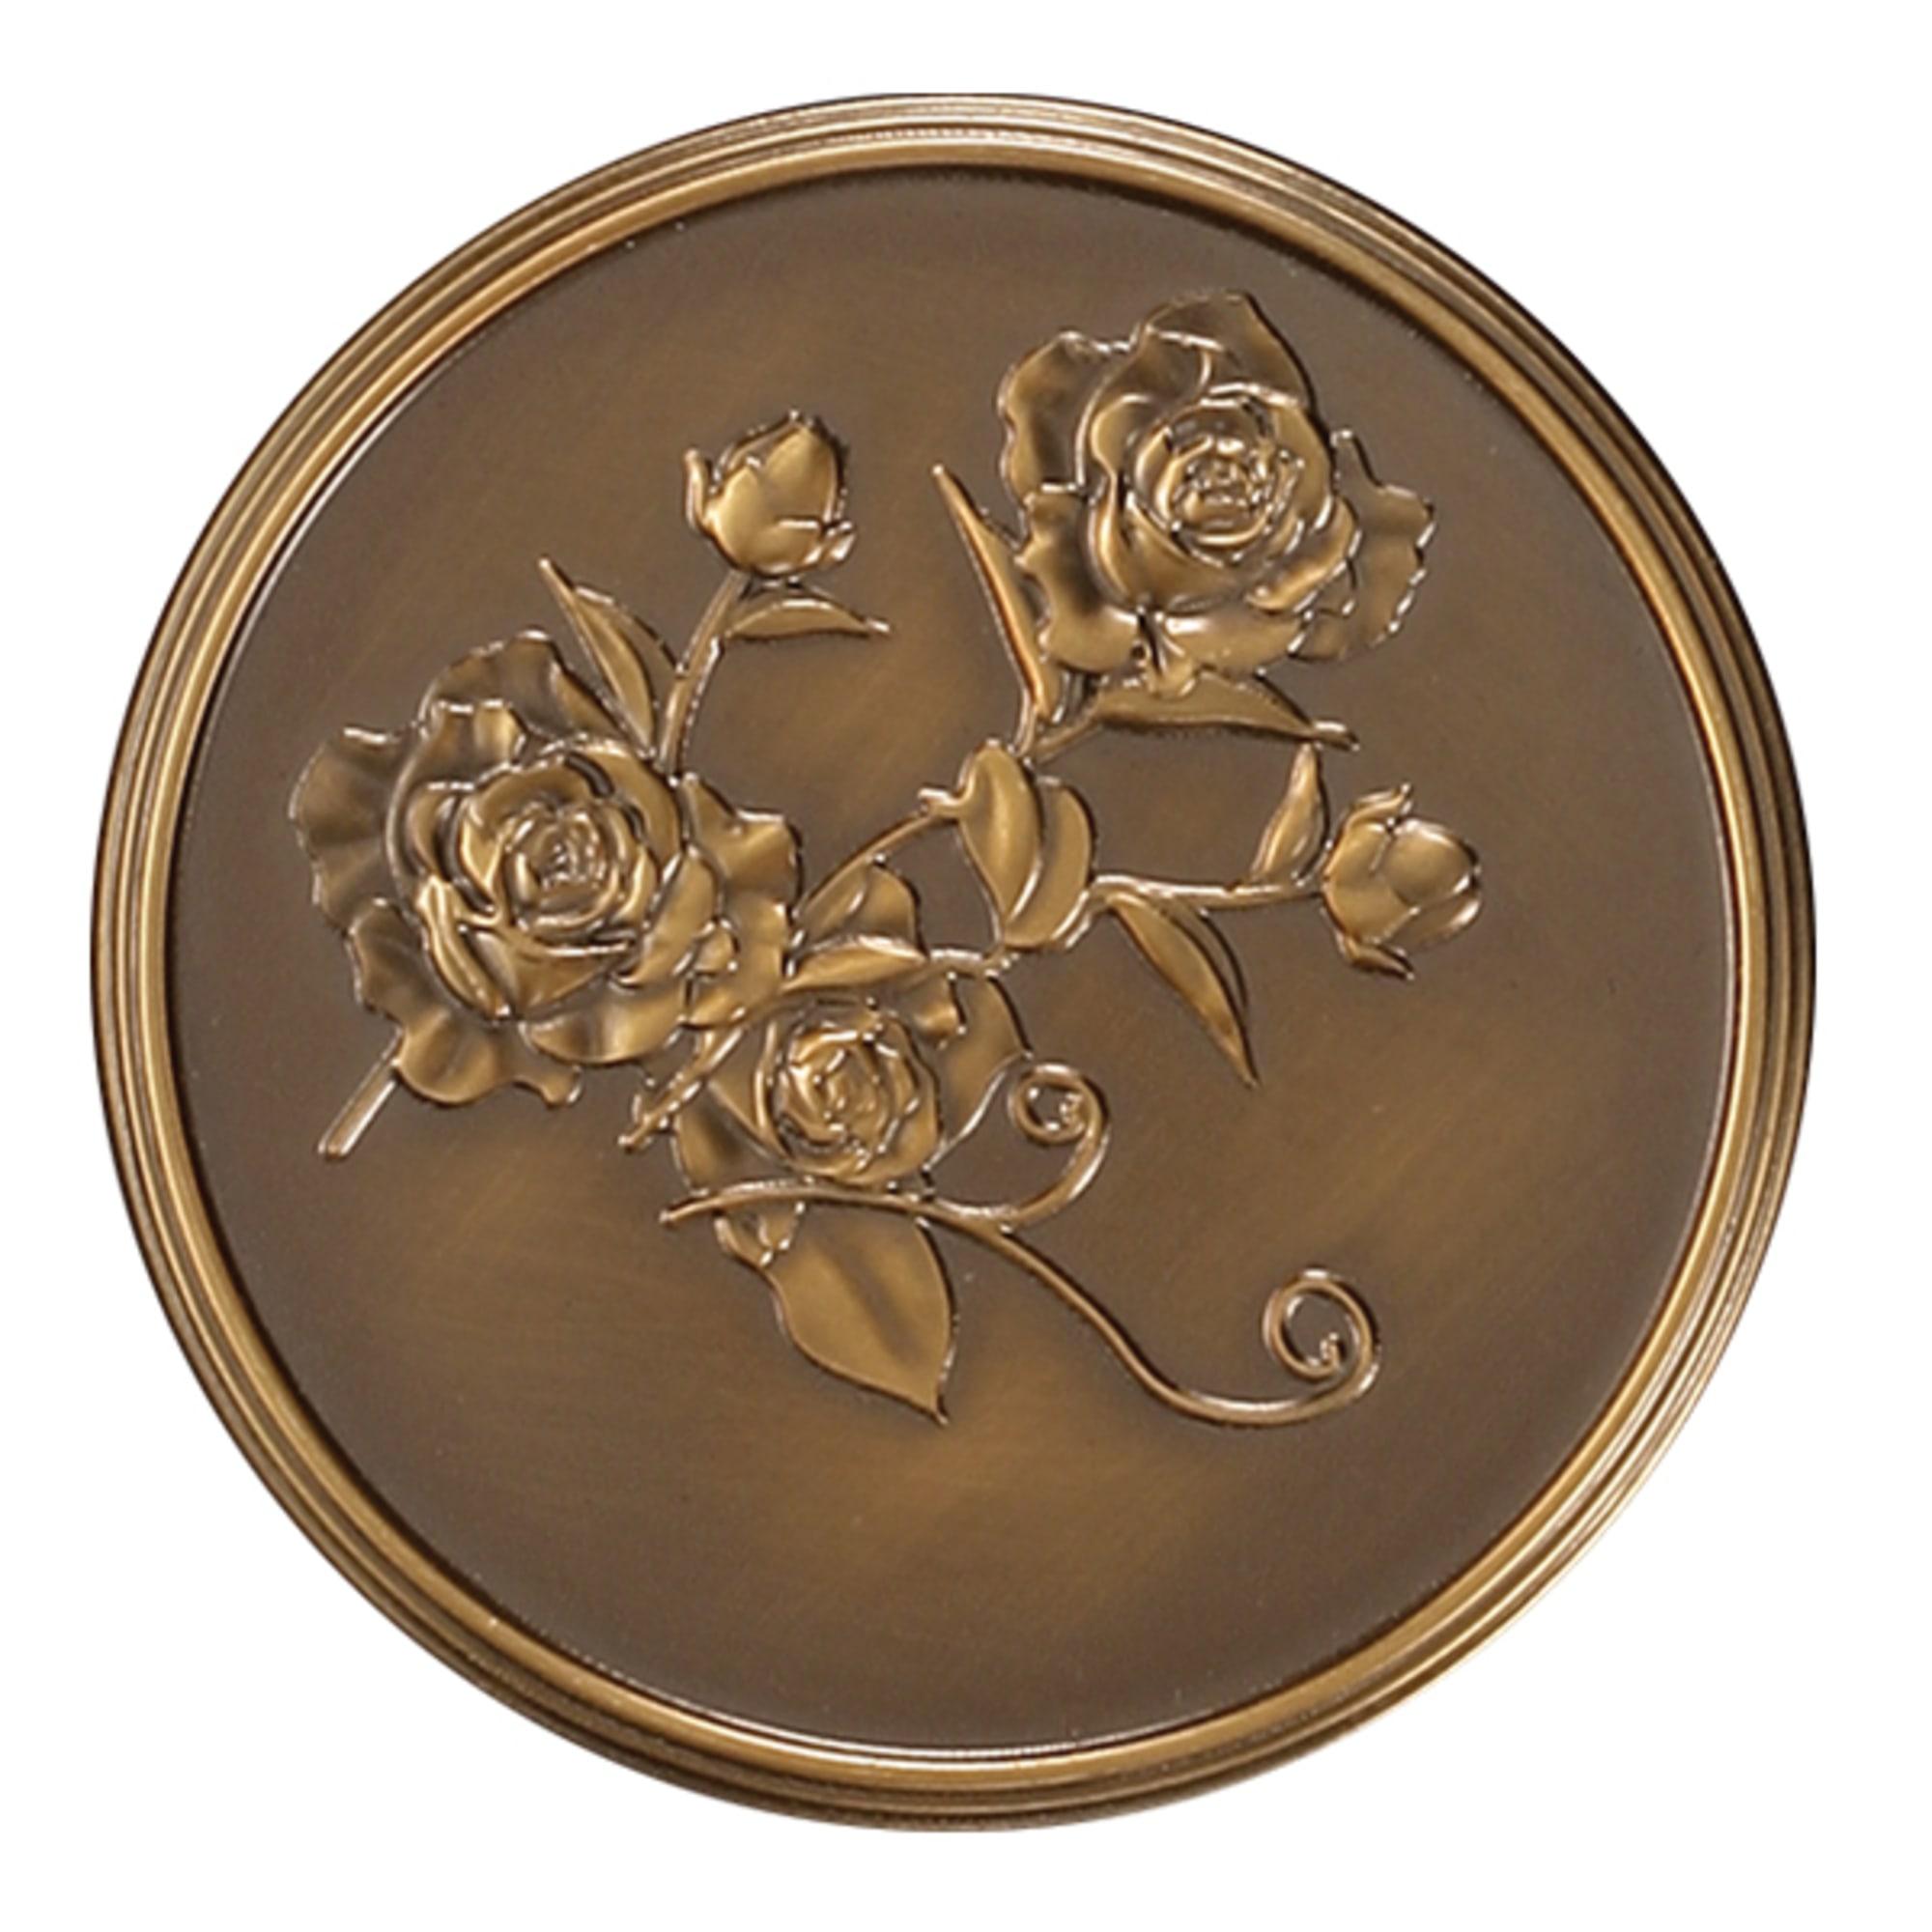 Image for 800-167 Roses from Howard Miller Official Website